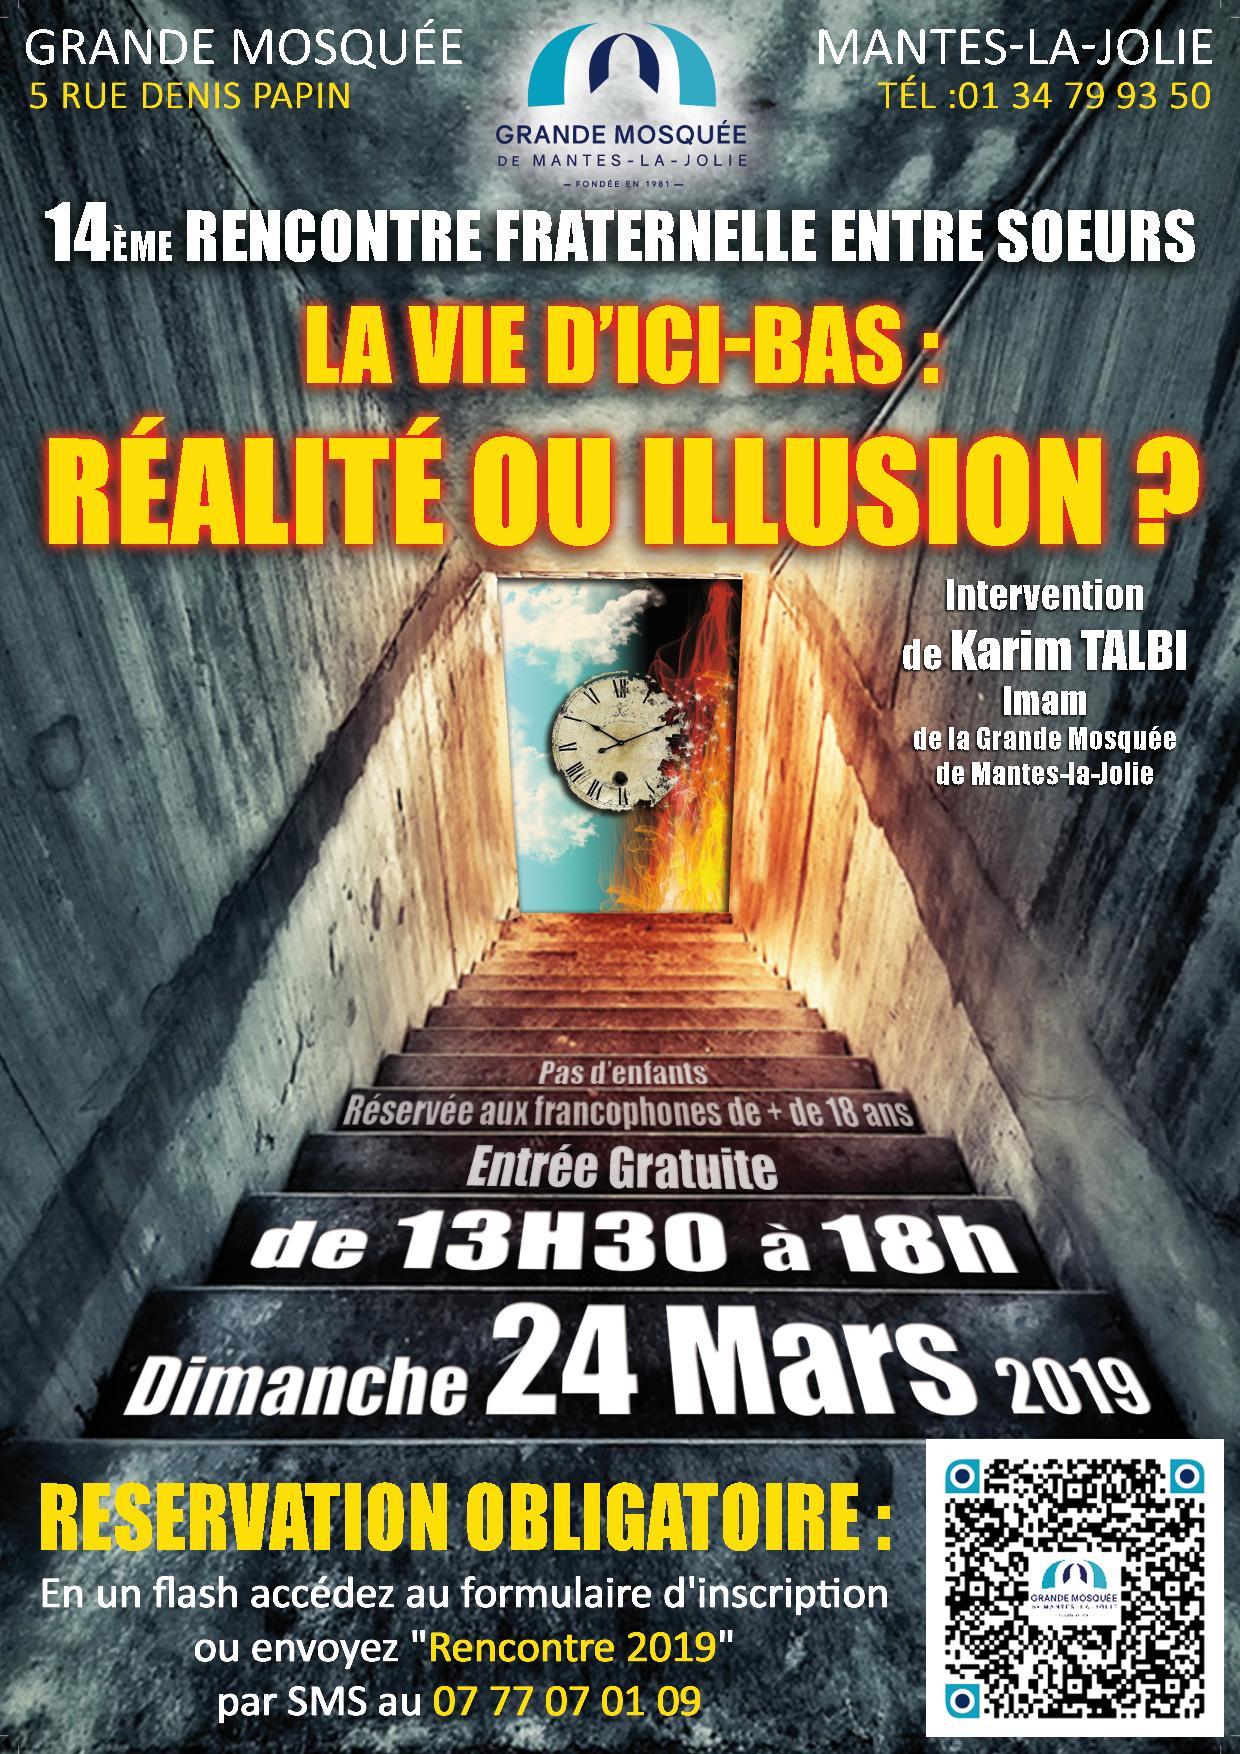 https://www.saphirnews.com/agenda/14e-rencontre-fraternelle-entre-soeurs_ae626583.html